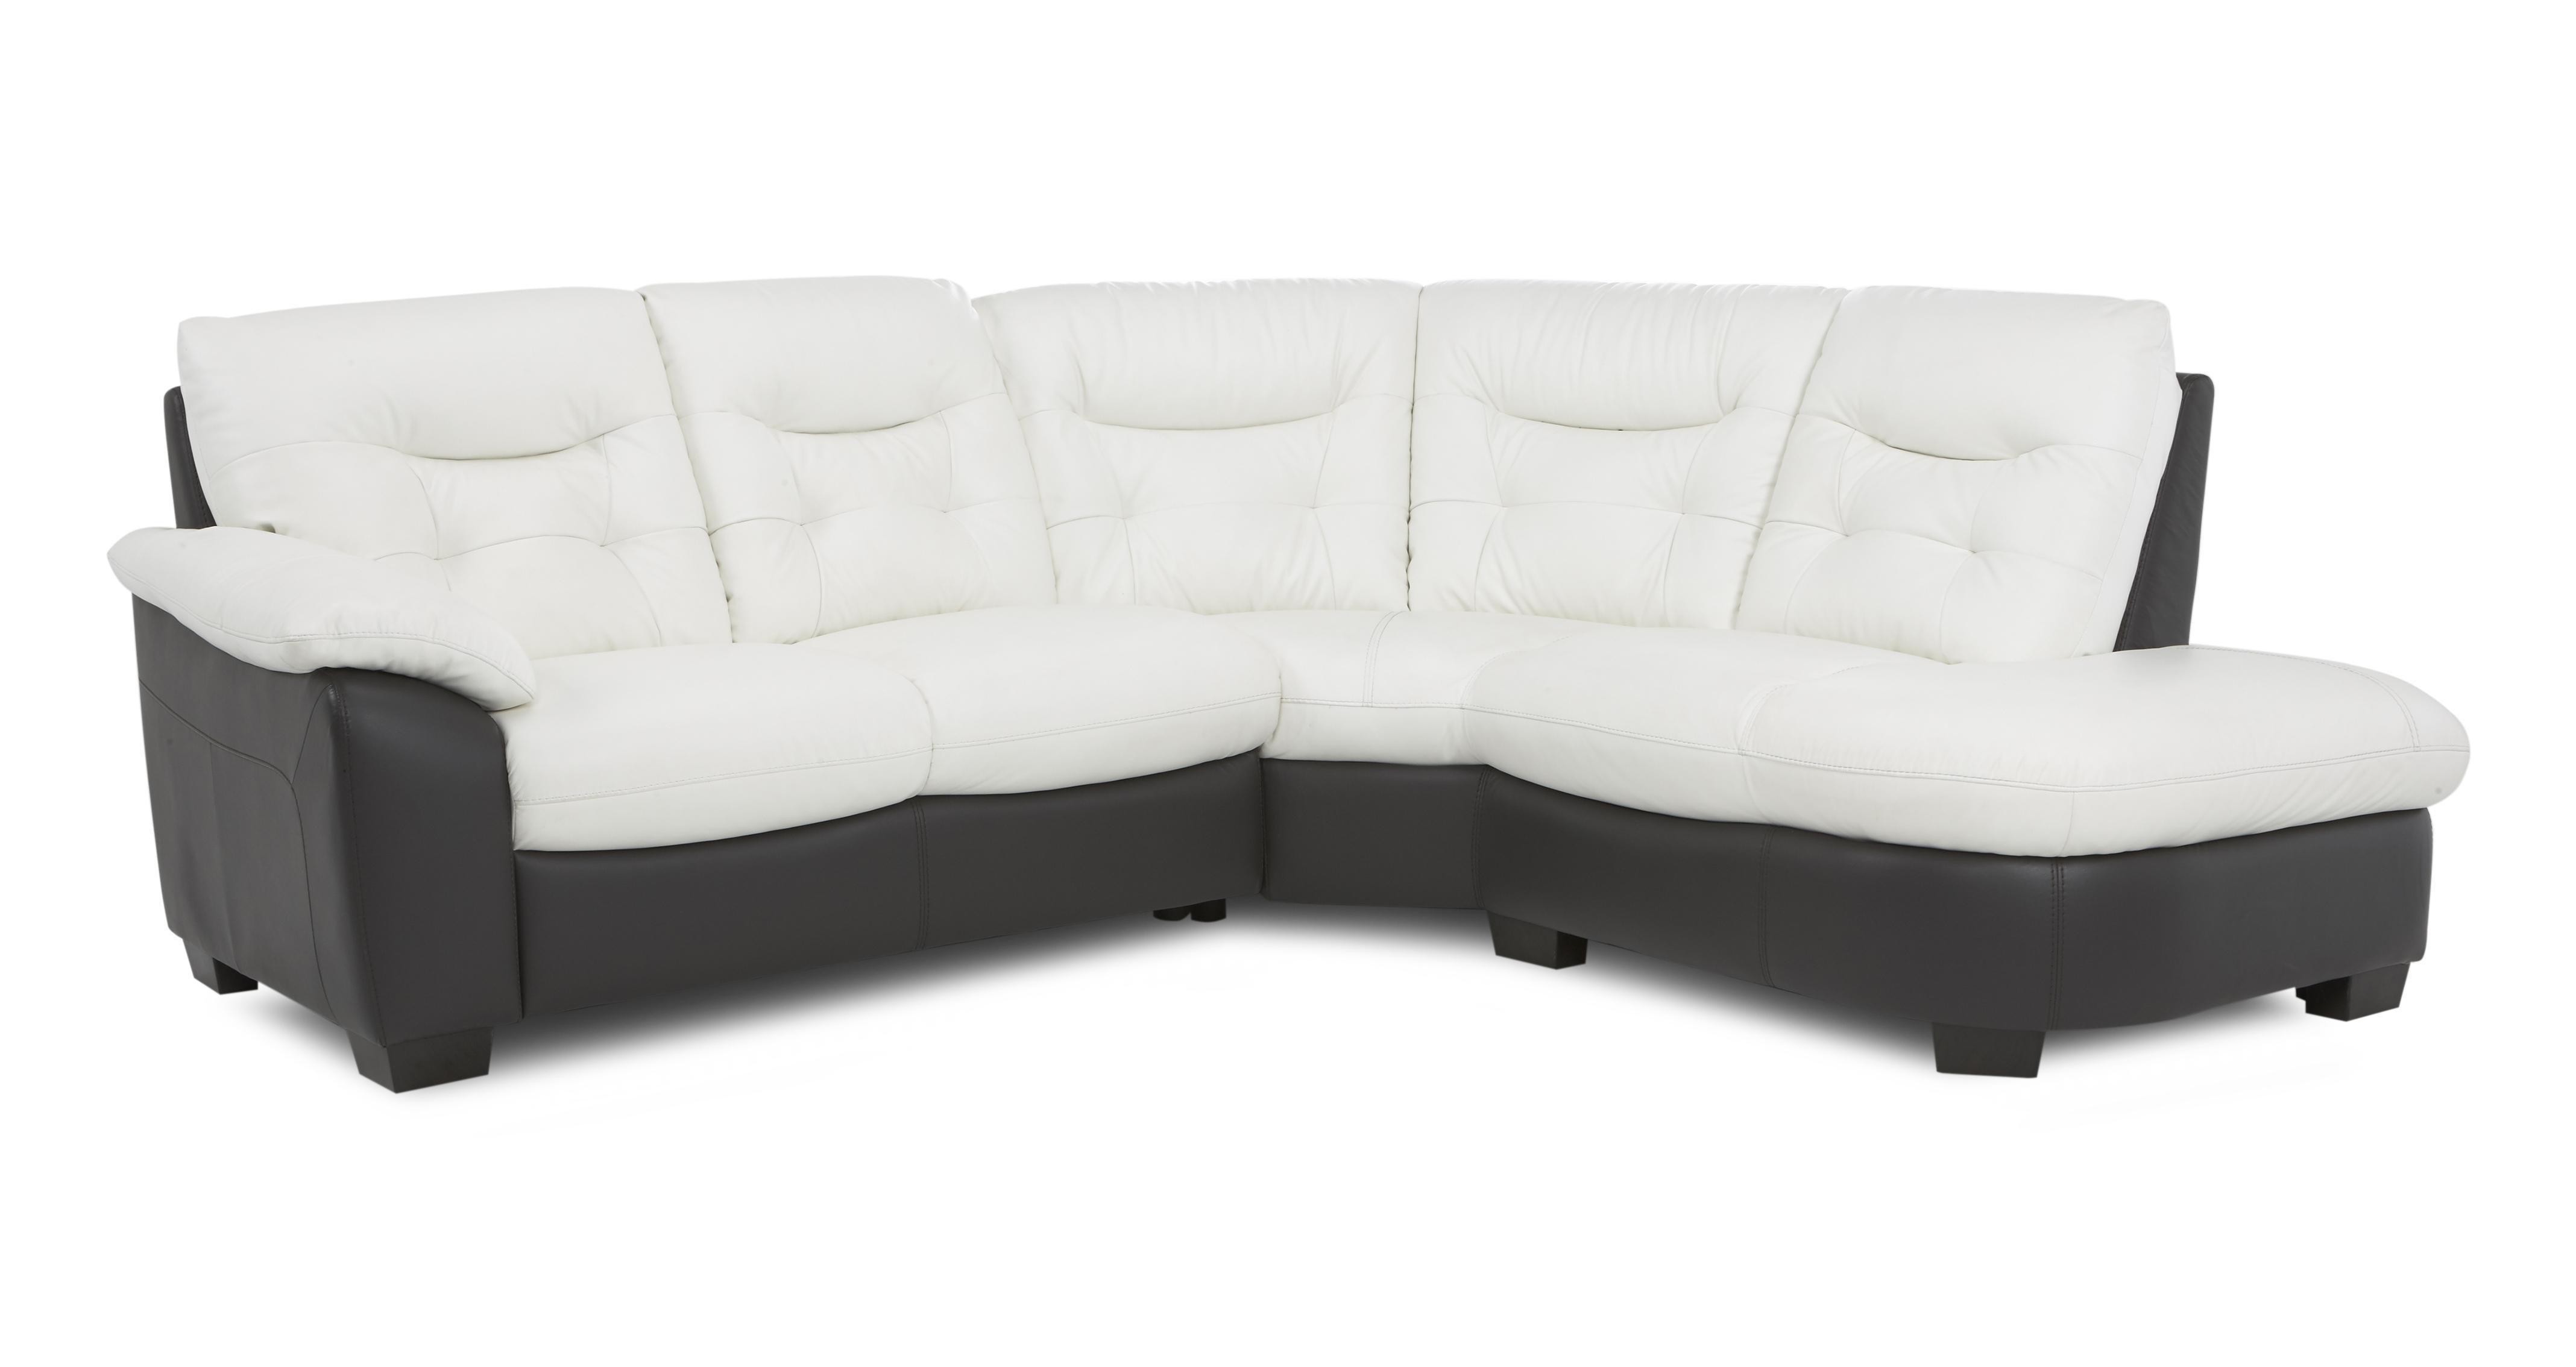 Dfs leather sofas reviews memsaheb dfs leather sofa bed review memsaheb net parisarafo Image collections